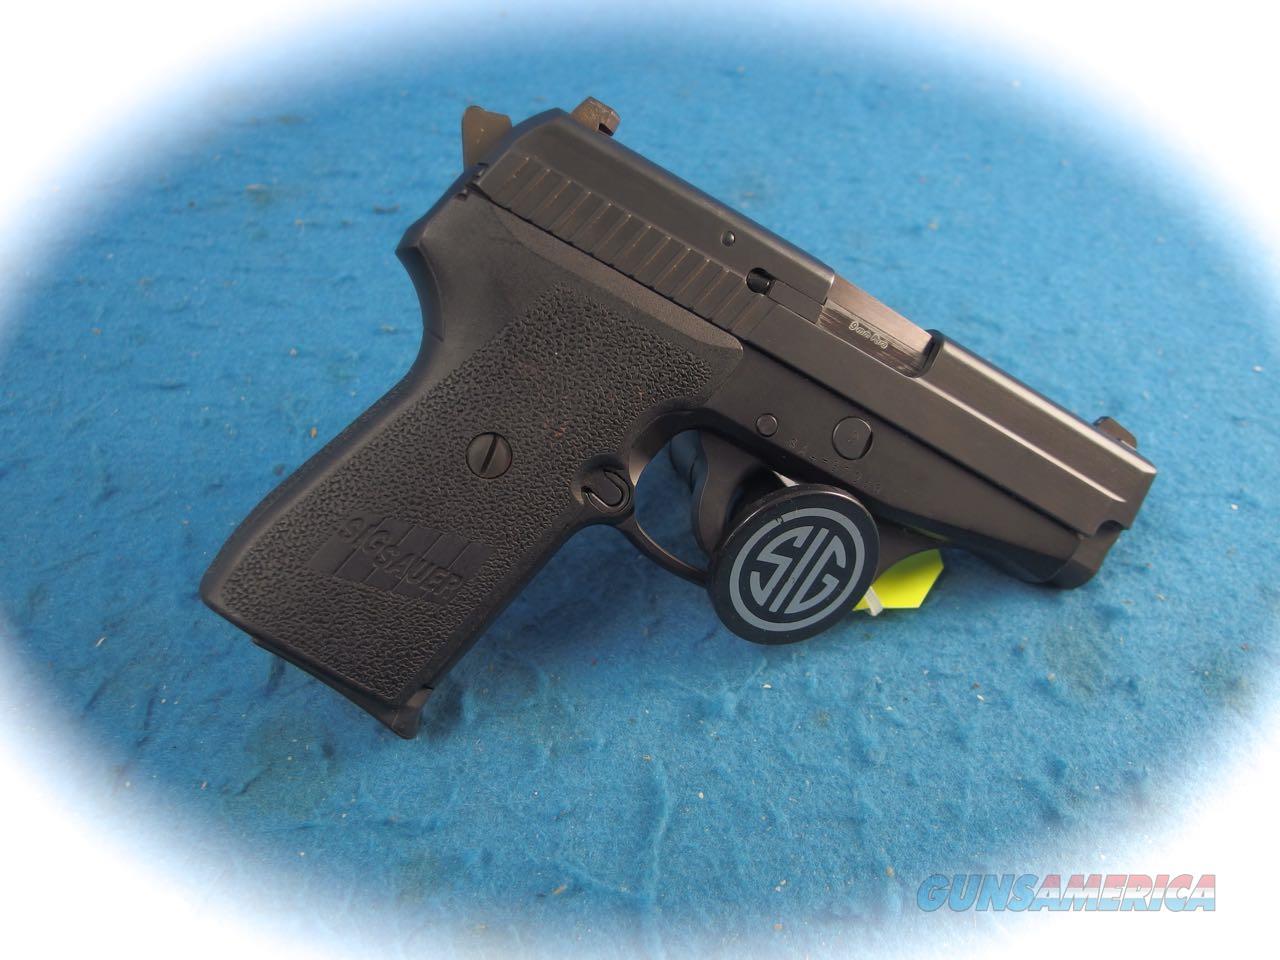 Sig Sauer P239 9mm Semi Auto Pistol **Used**  Guns > Pistols > Sig - Sauer/Sigarms Pistols > P239